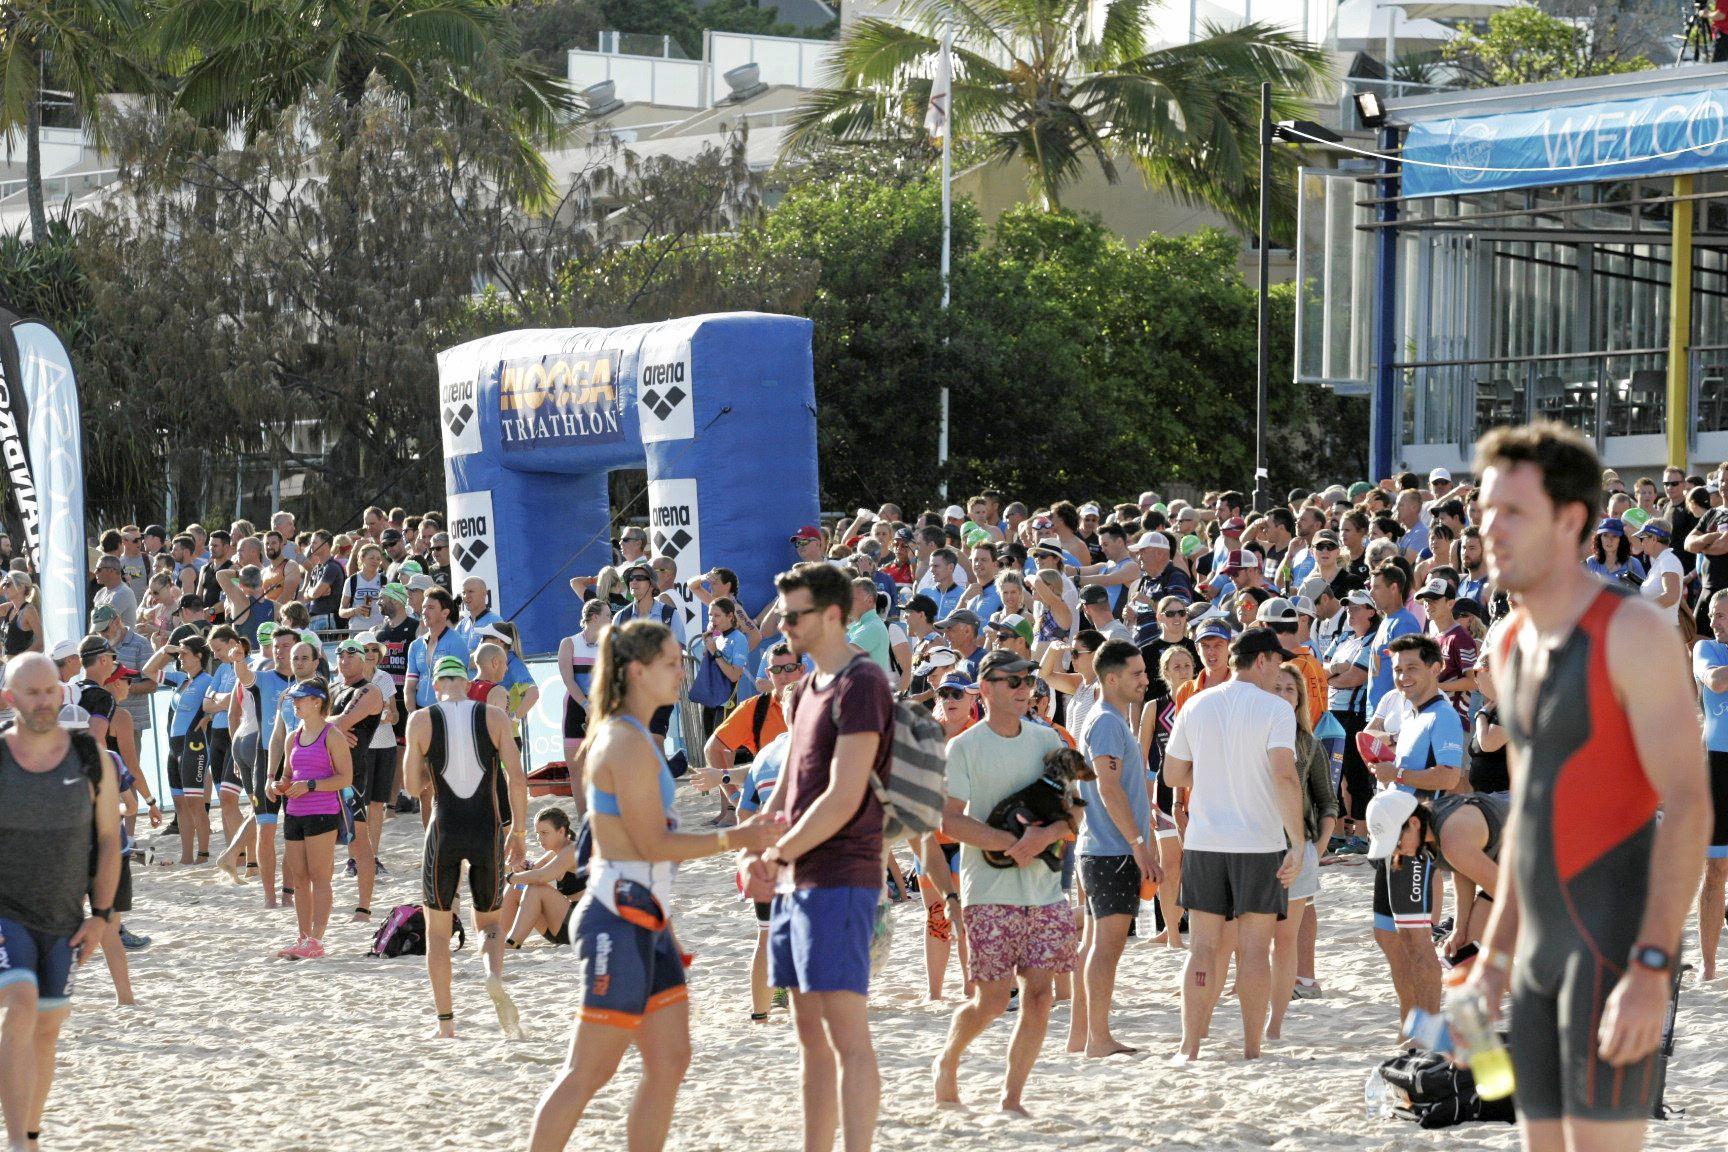 Overview of start of swim leg at Main Beach Noosa.